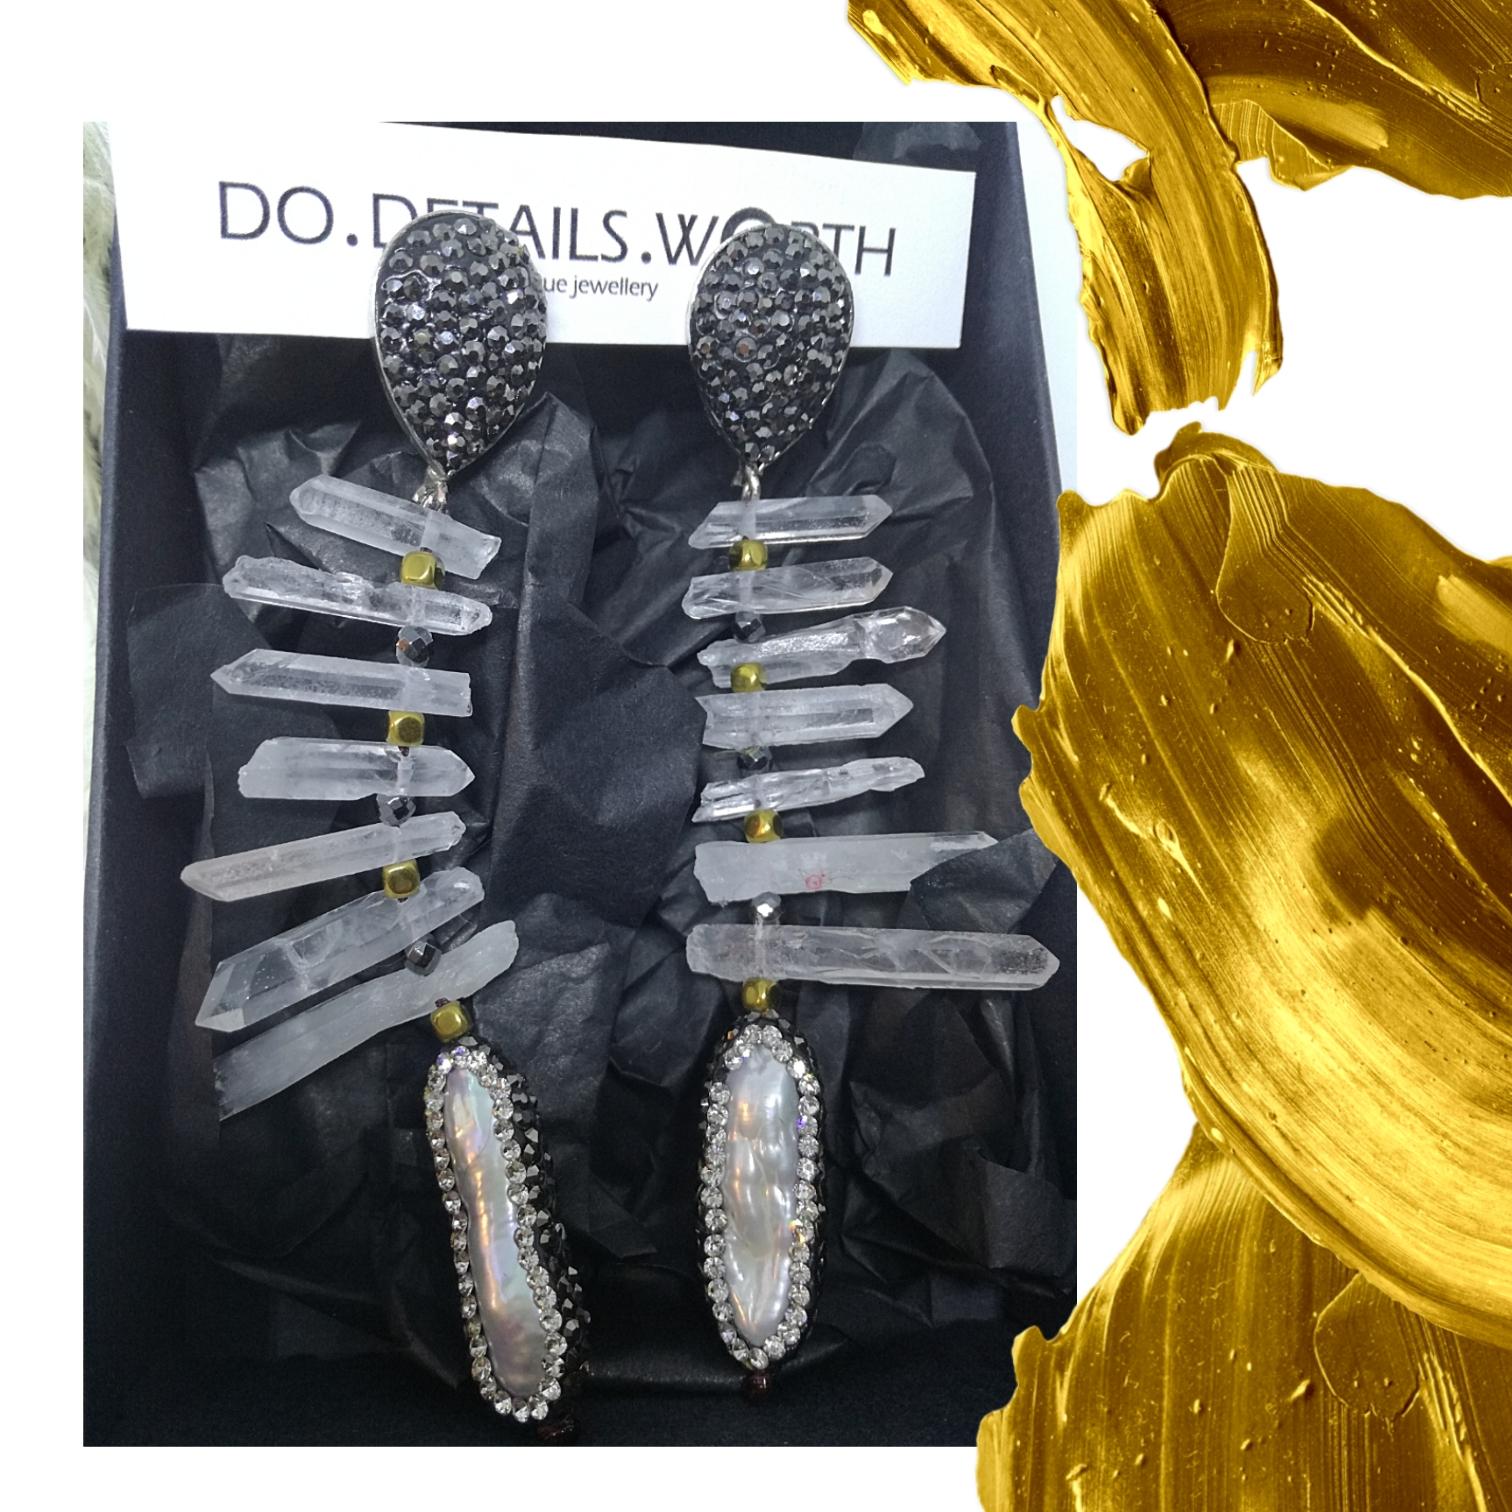 Do.Details.Worth.: Ένα brand κοσμημάτων που δίνει σημασία στη λεπτομέρεια